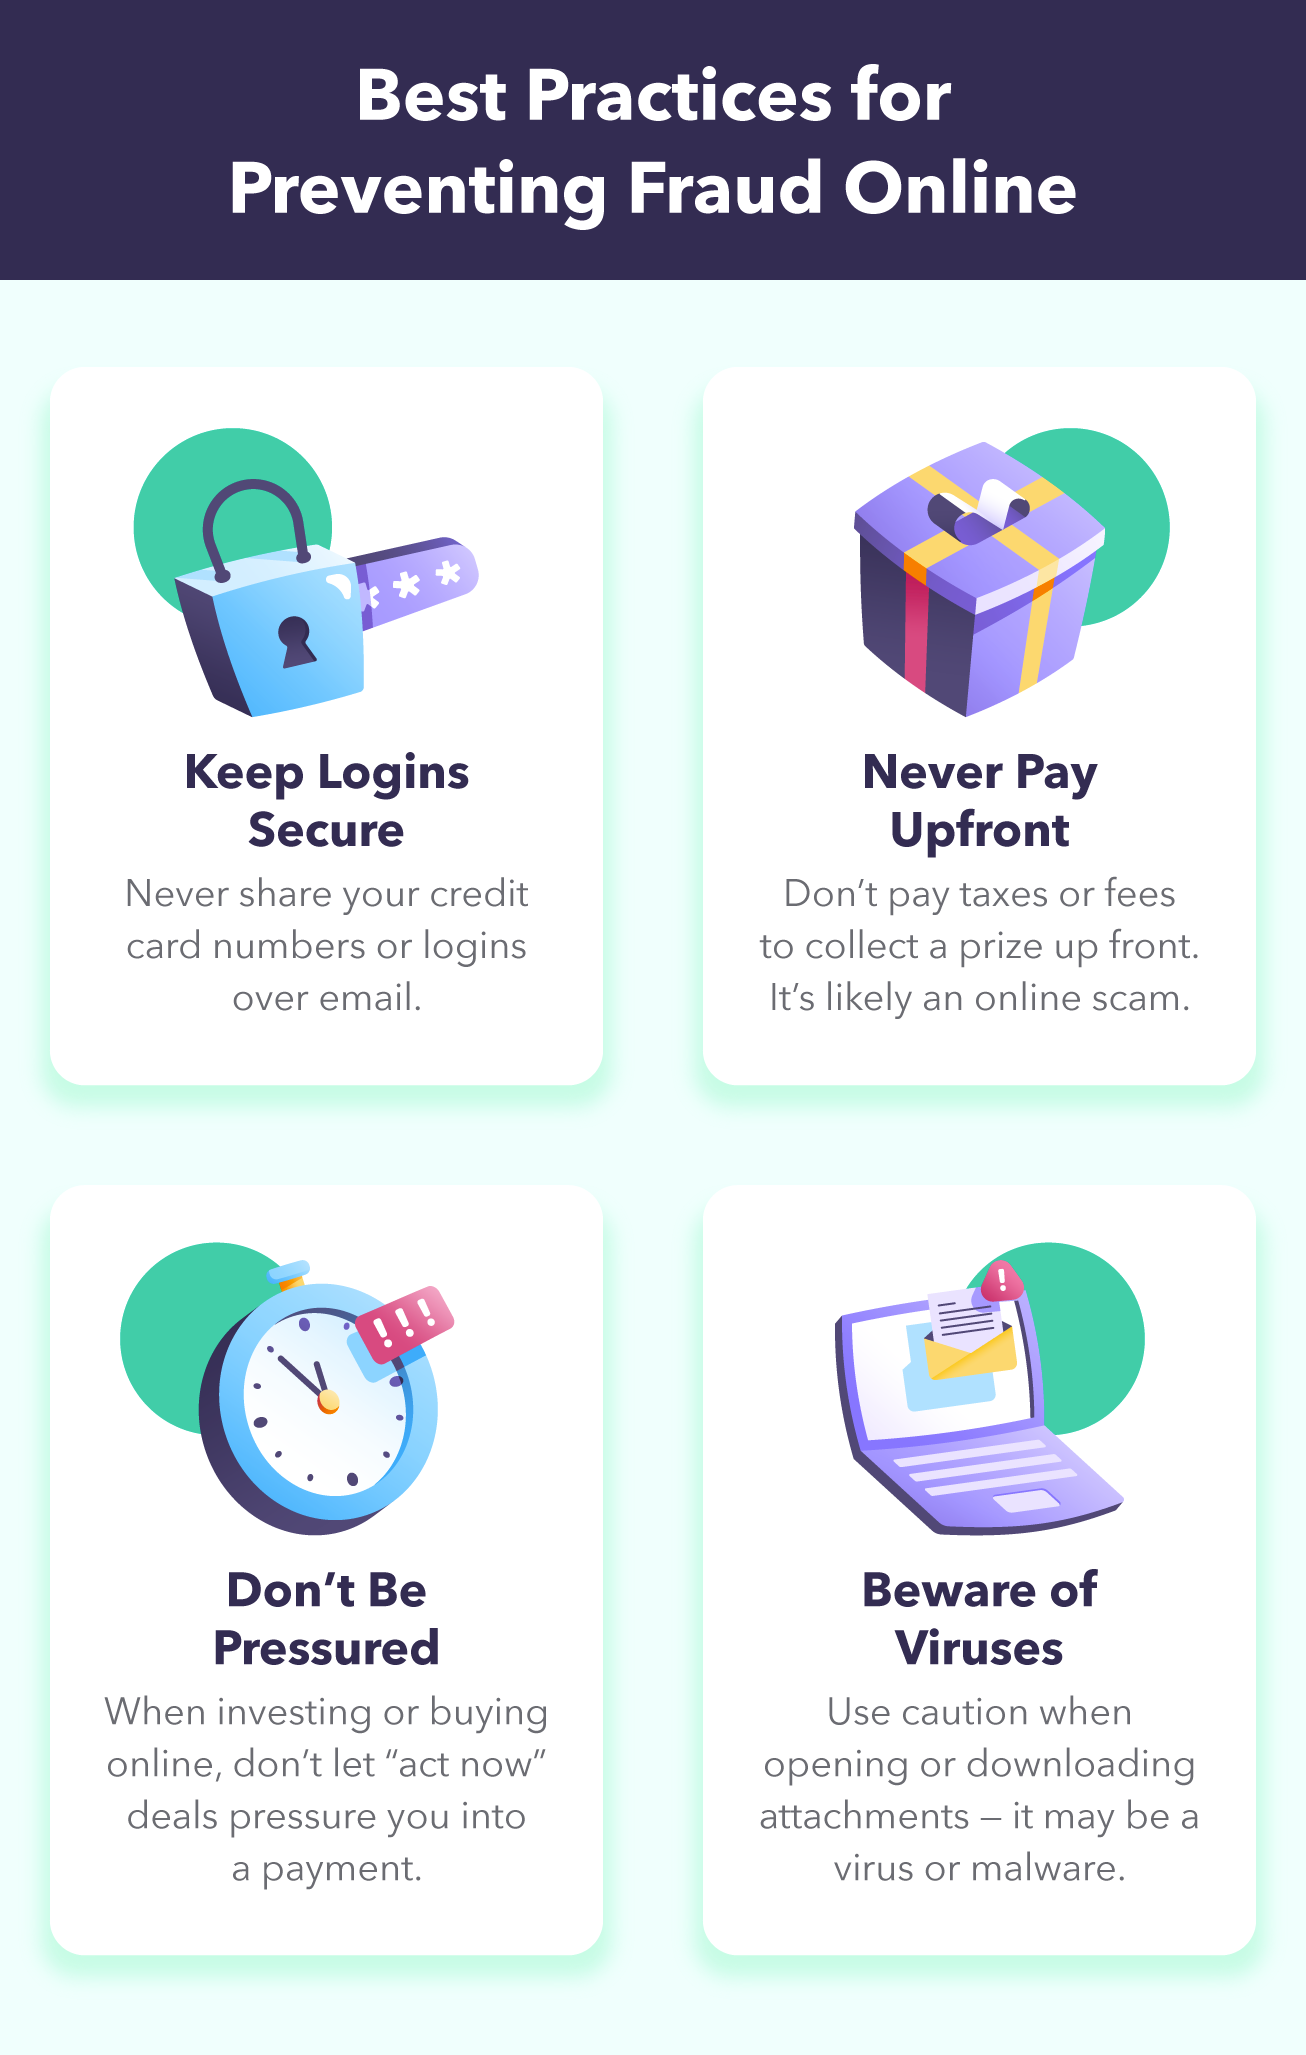 mejores-practicas-prevención-fraude-online